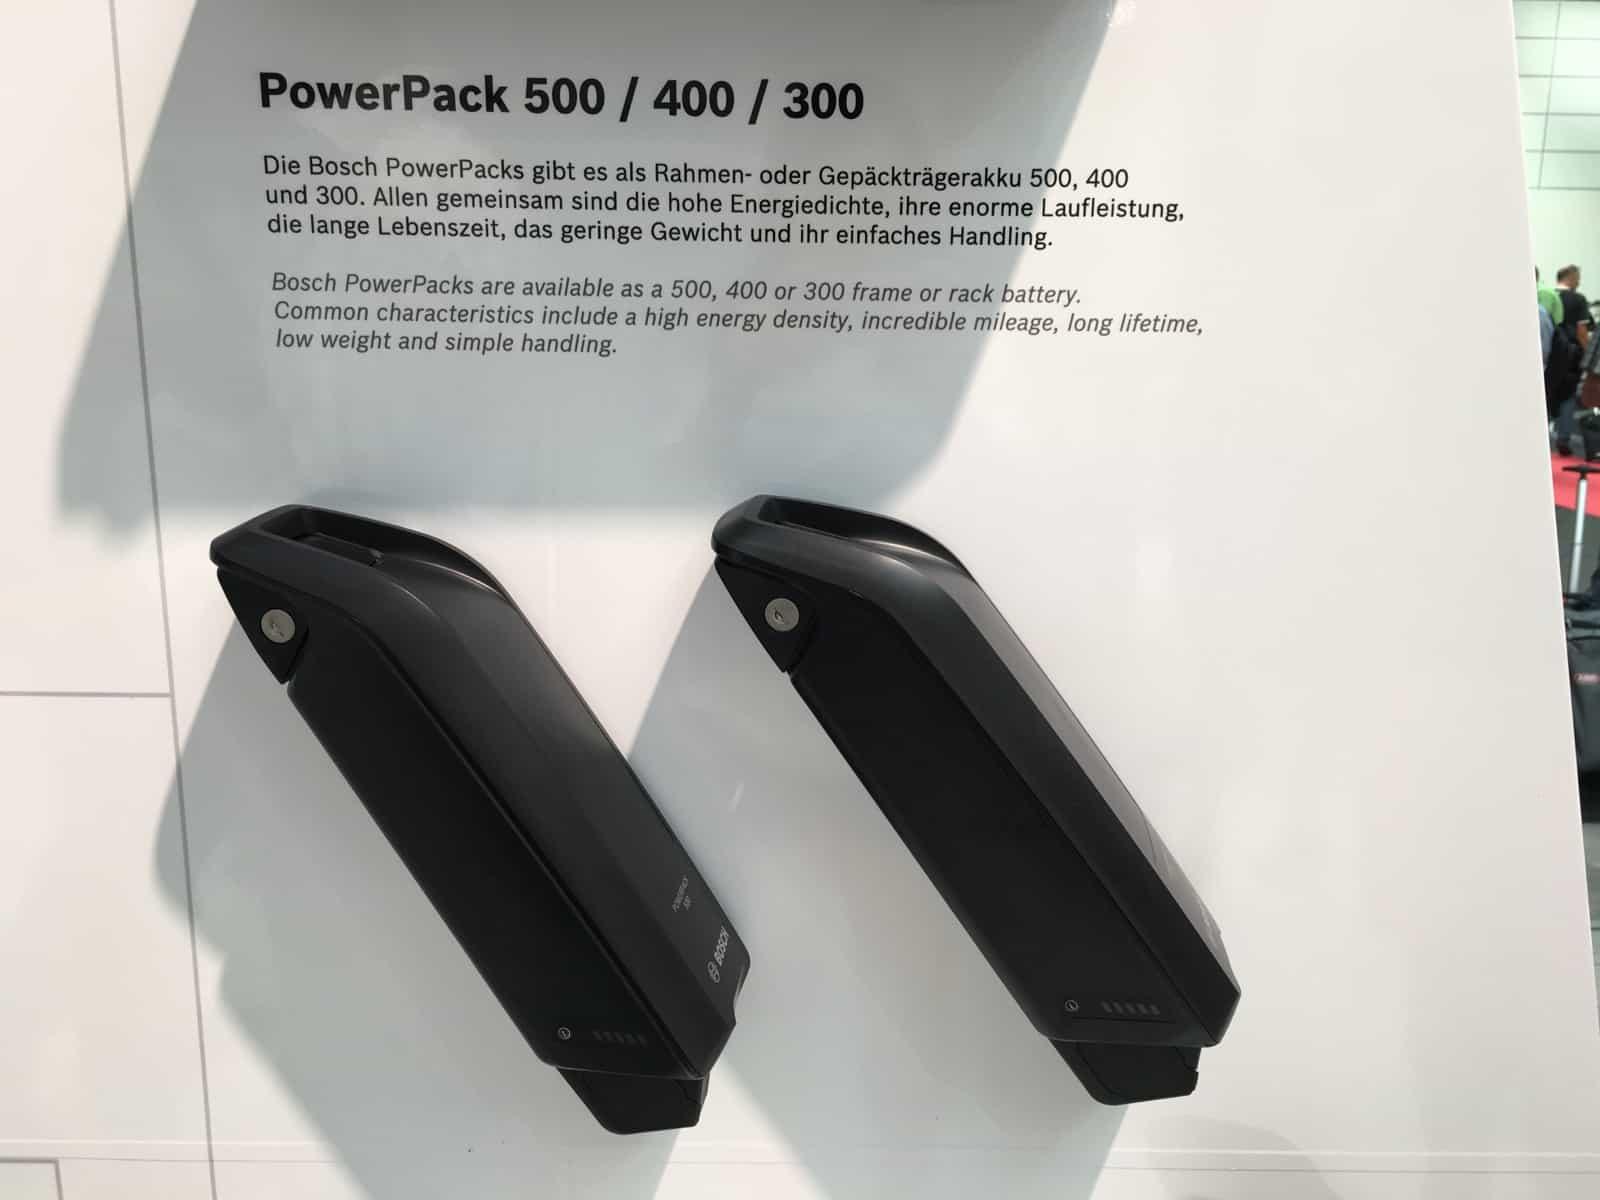 powerpack bosch batterie telaio 300 400 500 watt vari. Black Bedroom Furniture Sets. Home Design Ideas